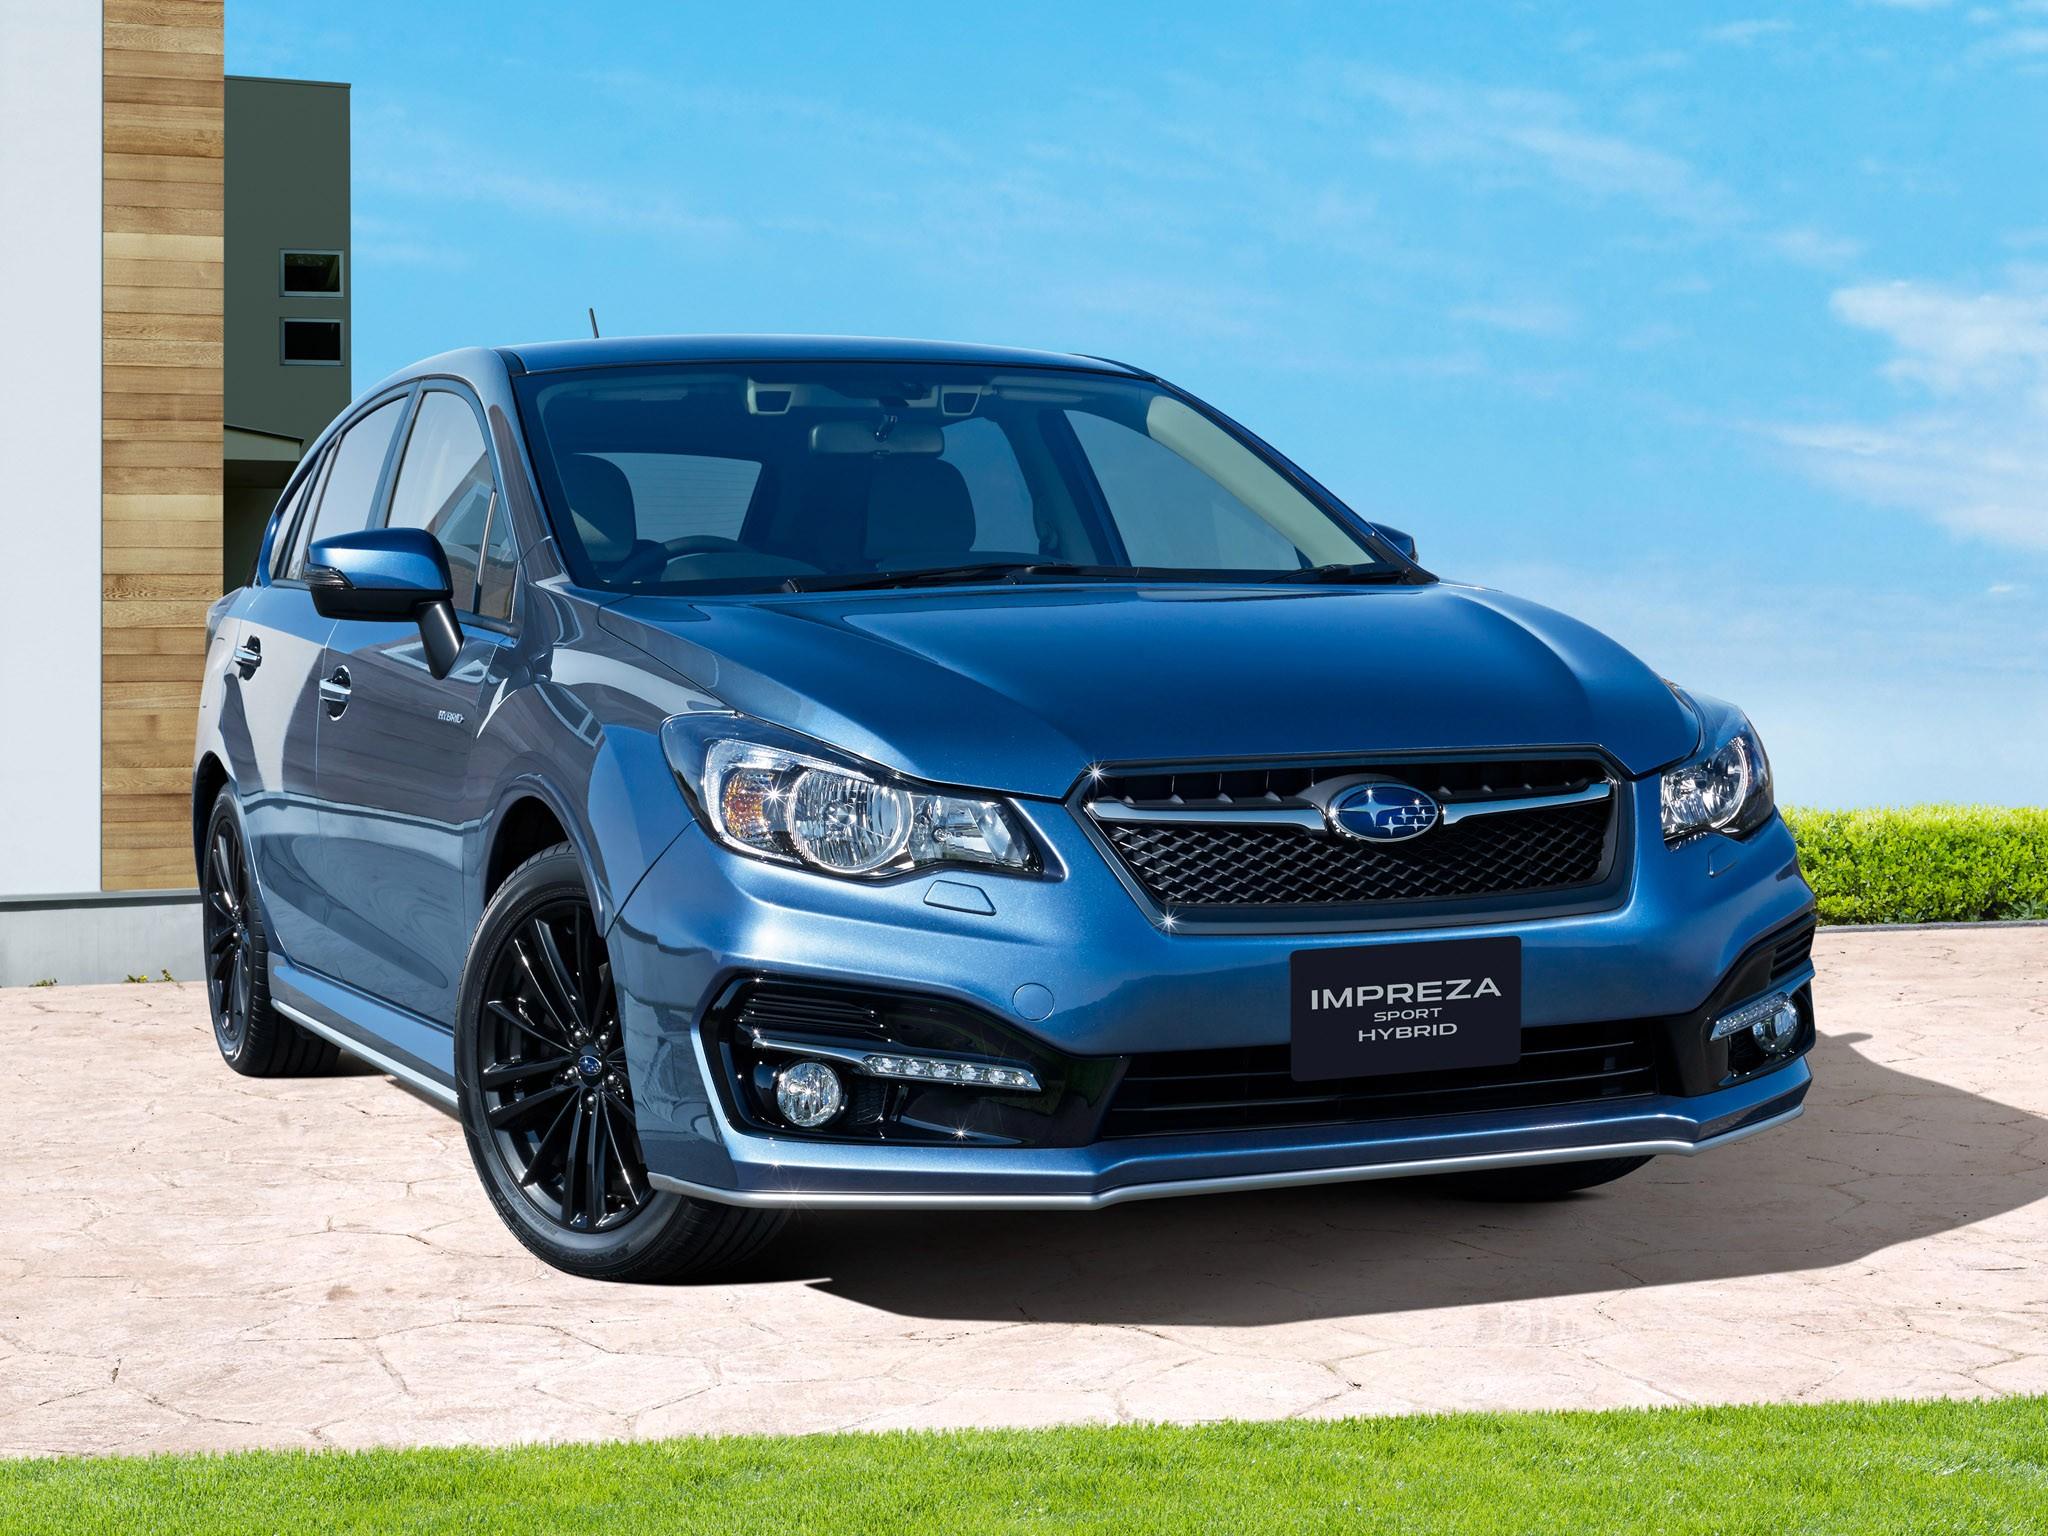 2015 Subaru Impreza Sport Hybride